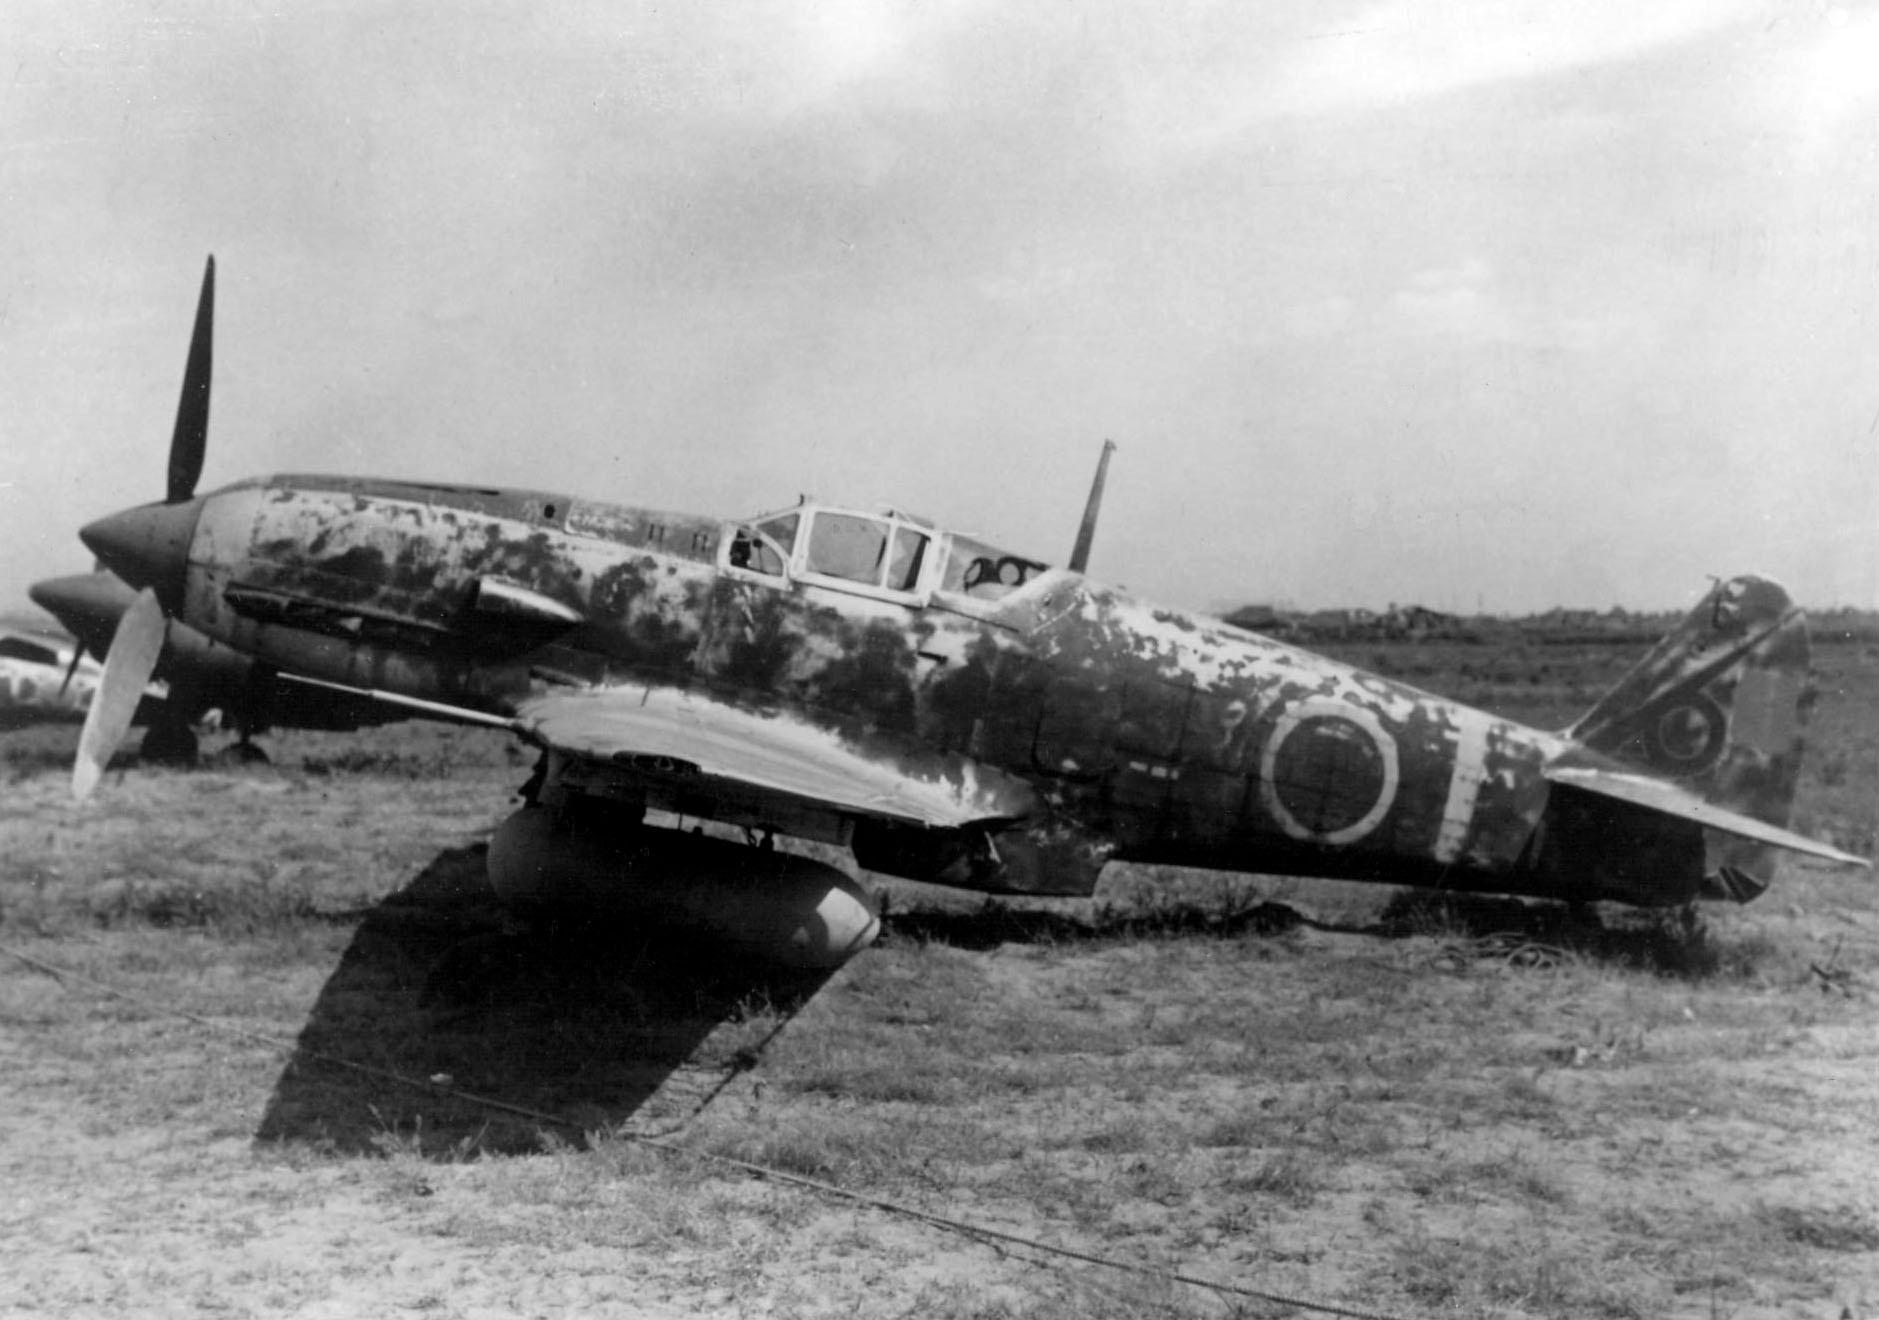 Kawasaki_Ki-61_Hien_with_drop_tank.jpeg